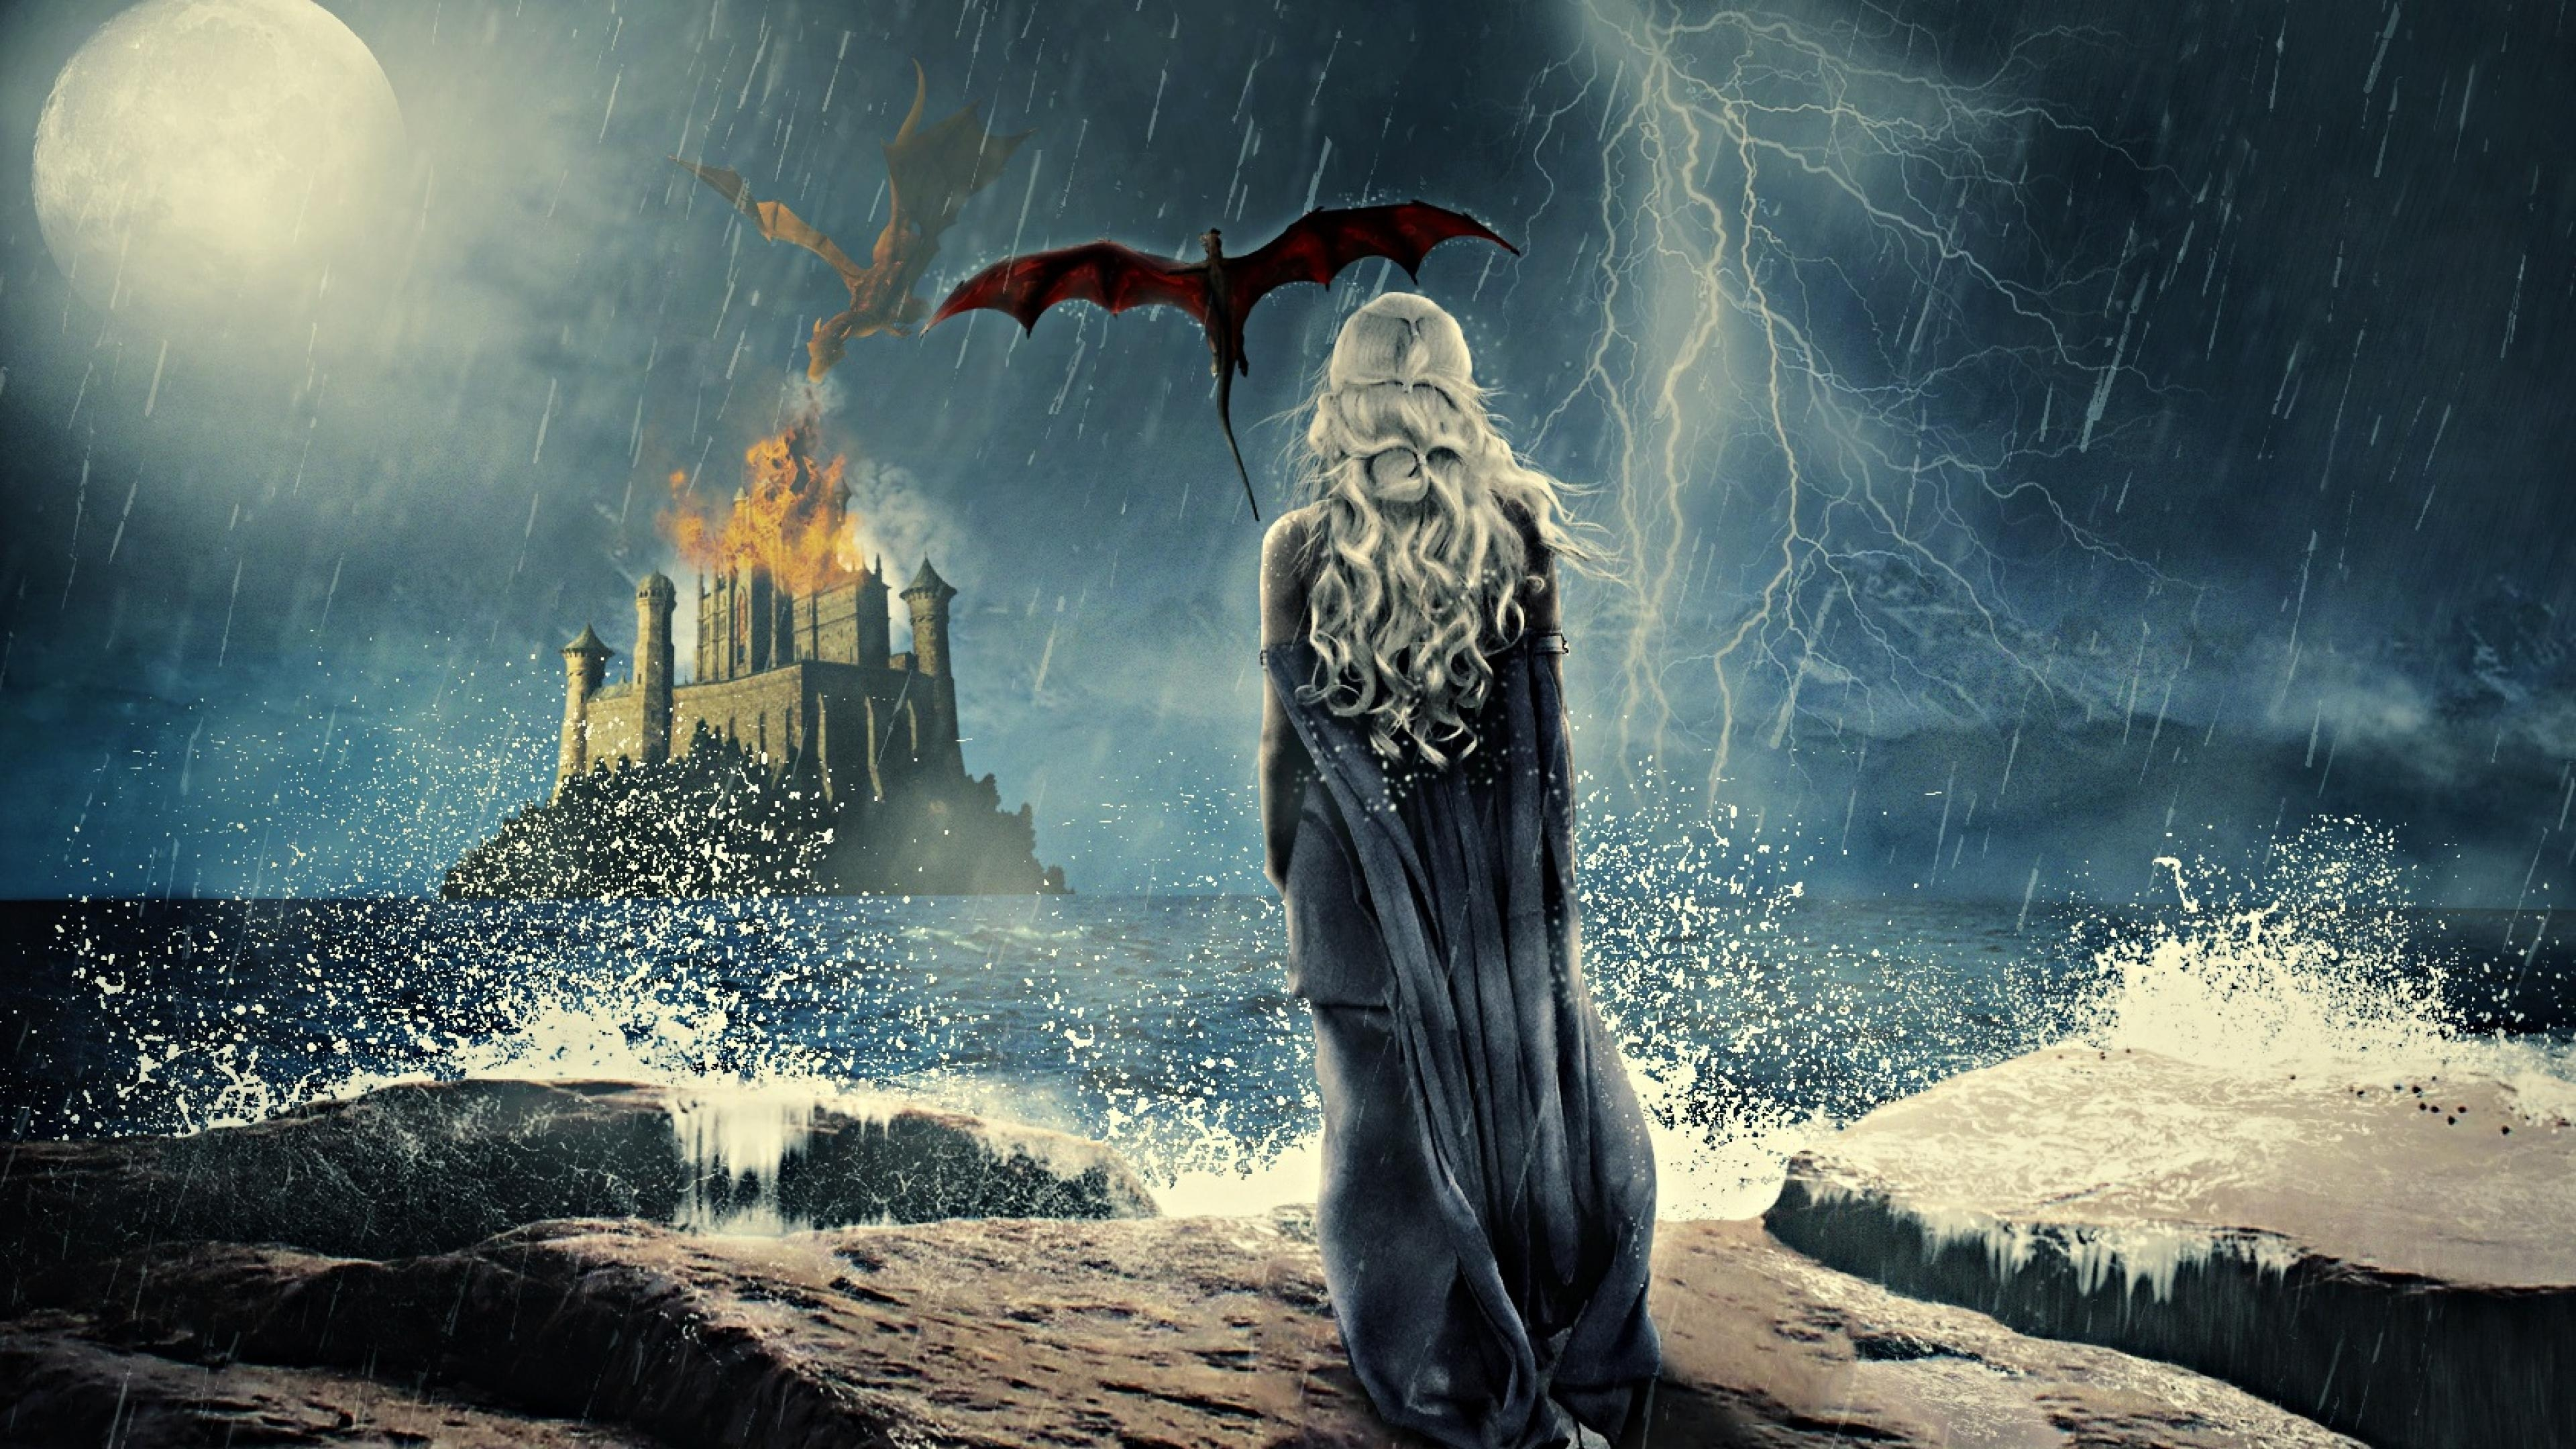 Game Of Thrones Khaleesi Art 4k Hd Tv Shows 4k Wallpapers